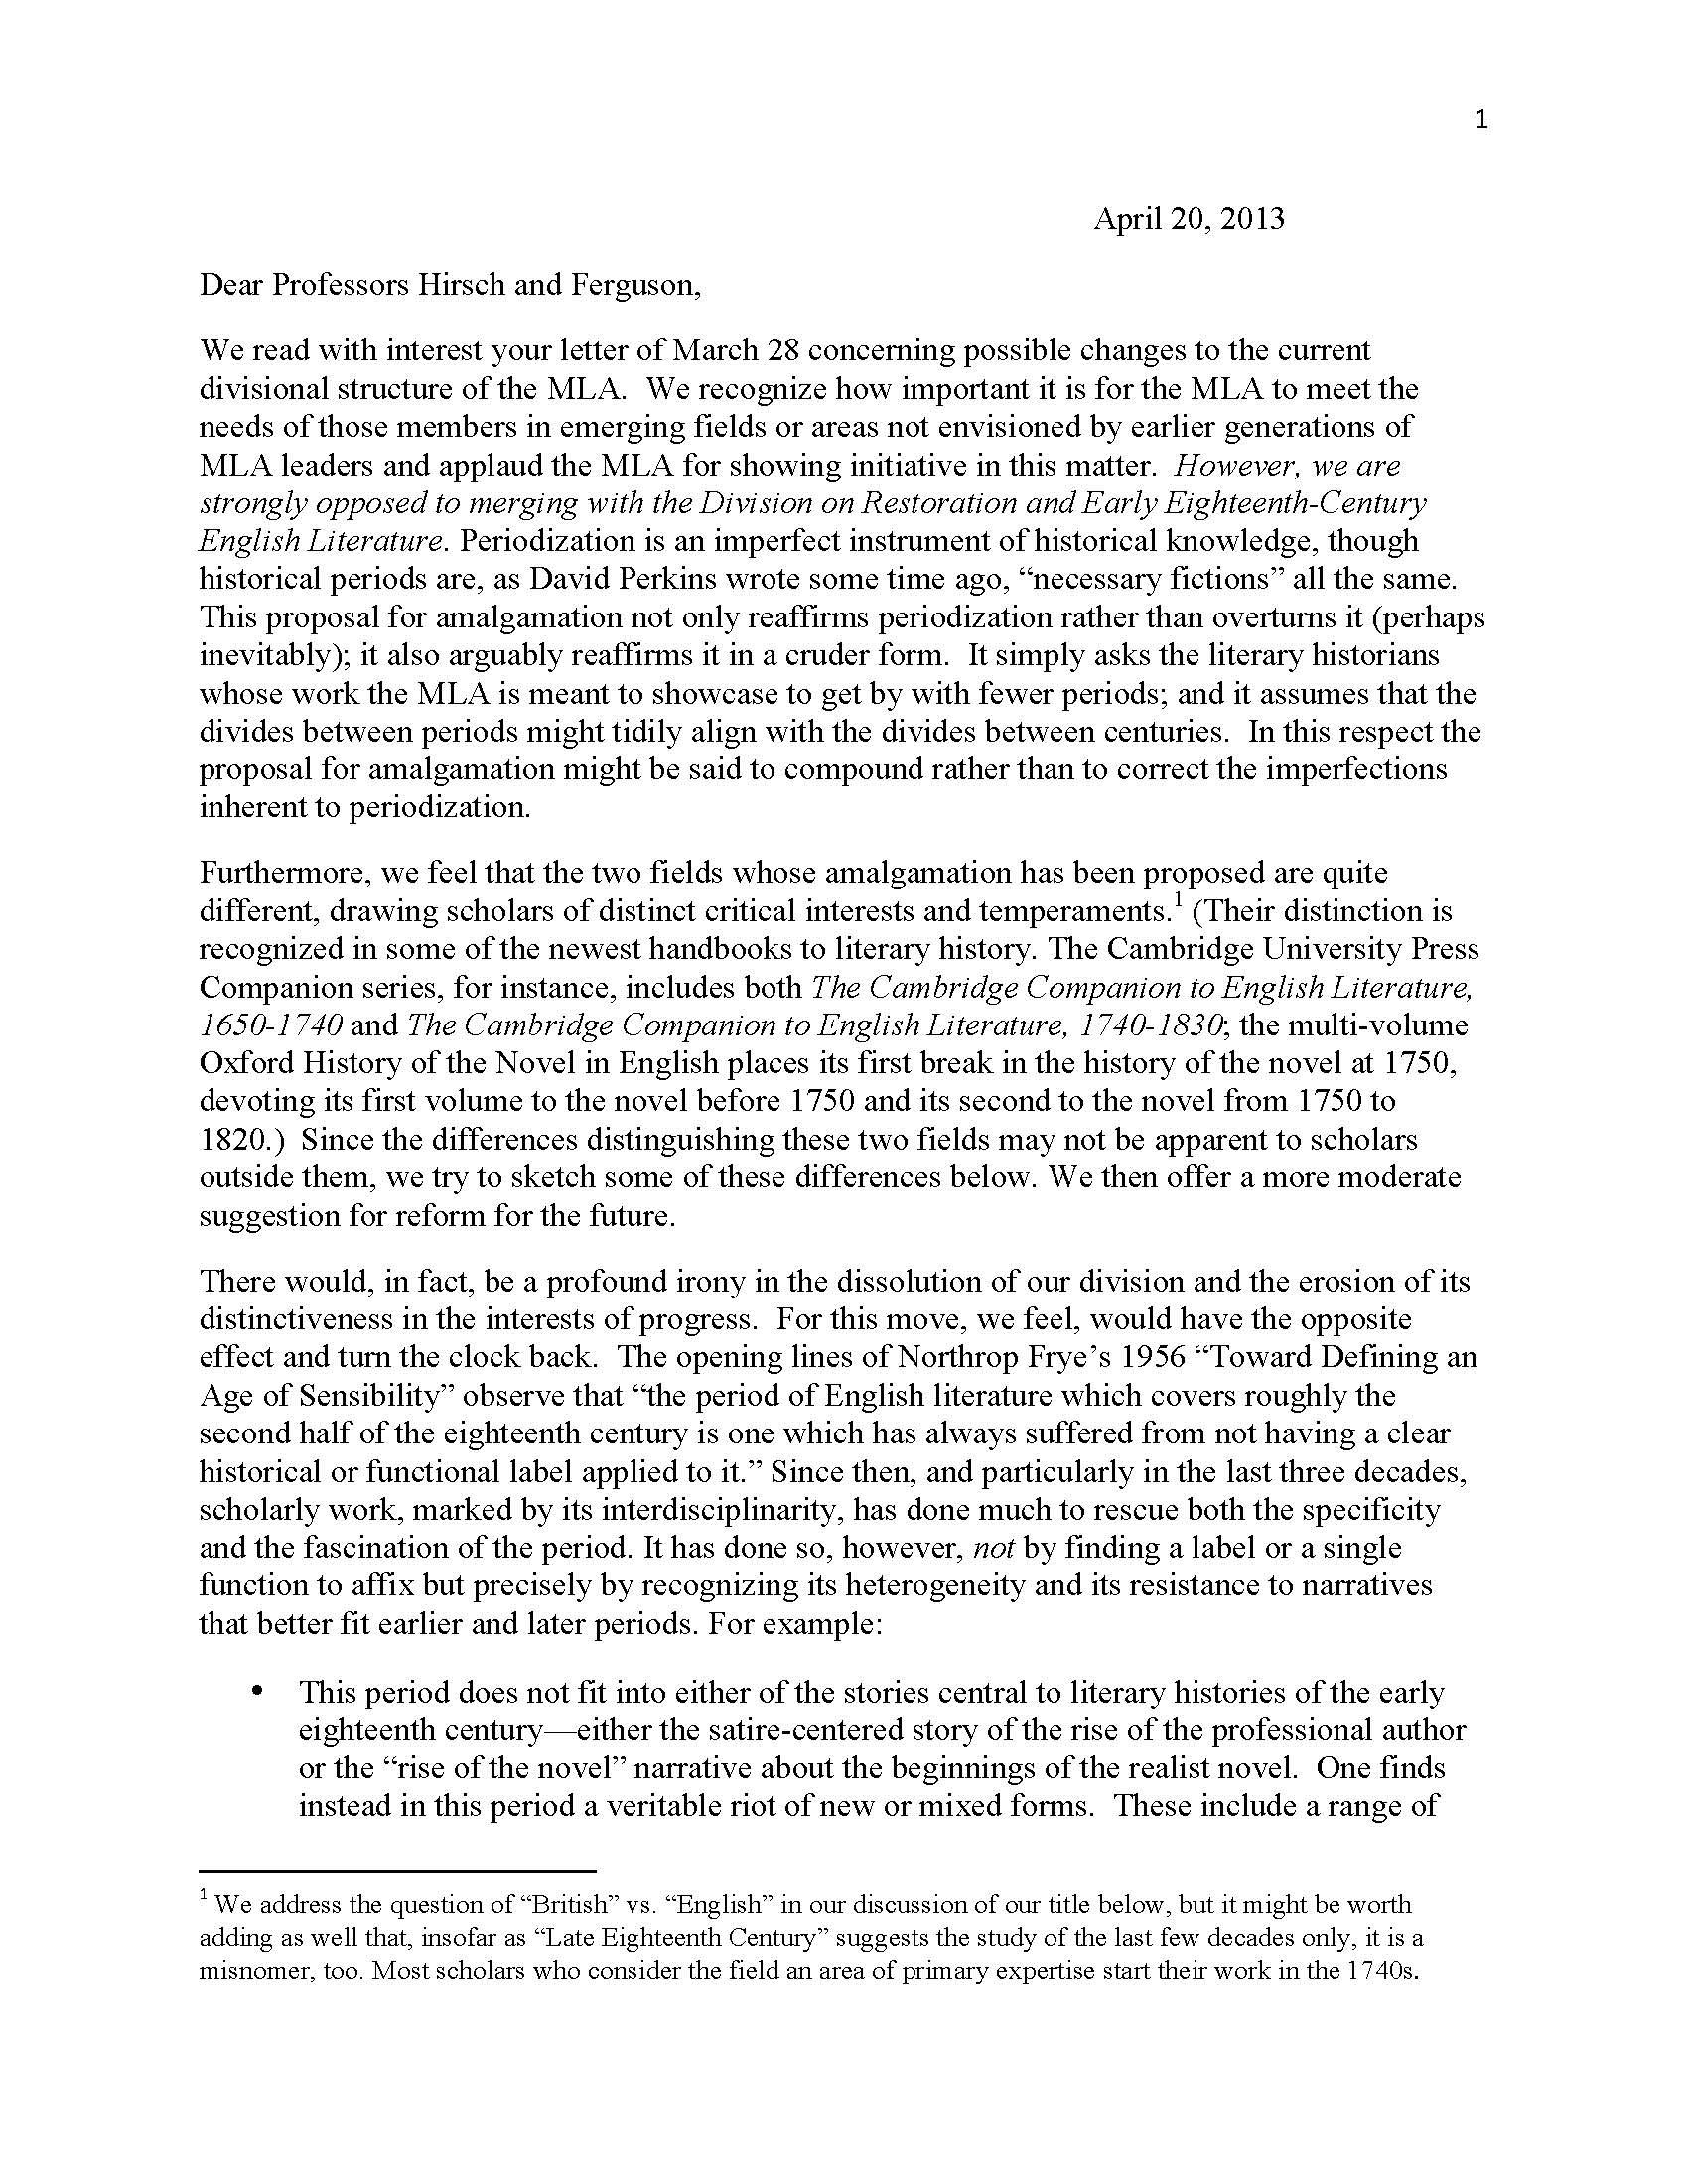 008 Essay Proposal Response To Marianne Hirsch Margaret Ferguson Rev Final Copy Page 1 Top Samples Mla Format Satirical Ideas Full